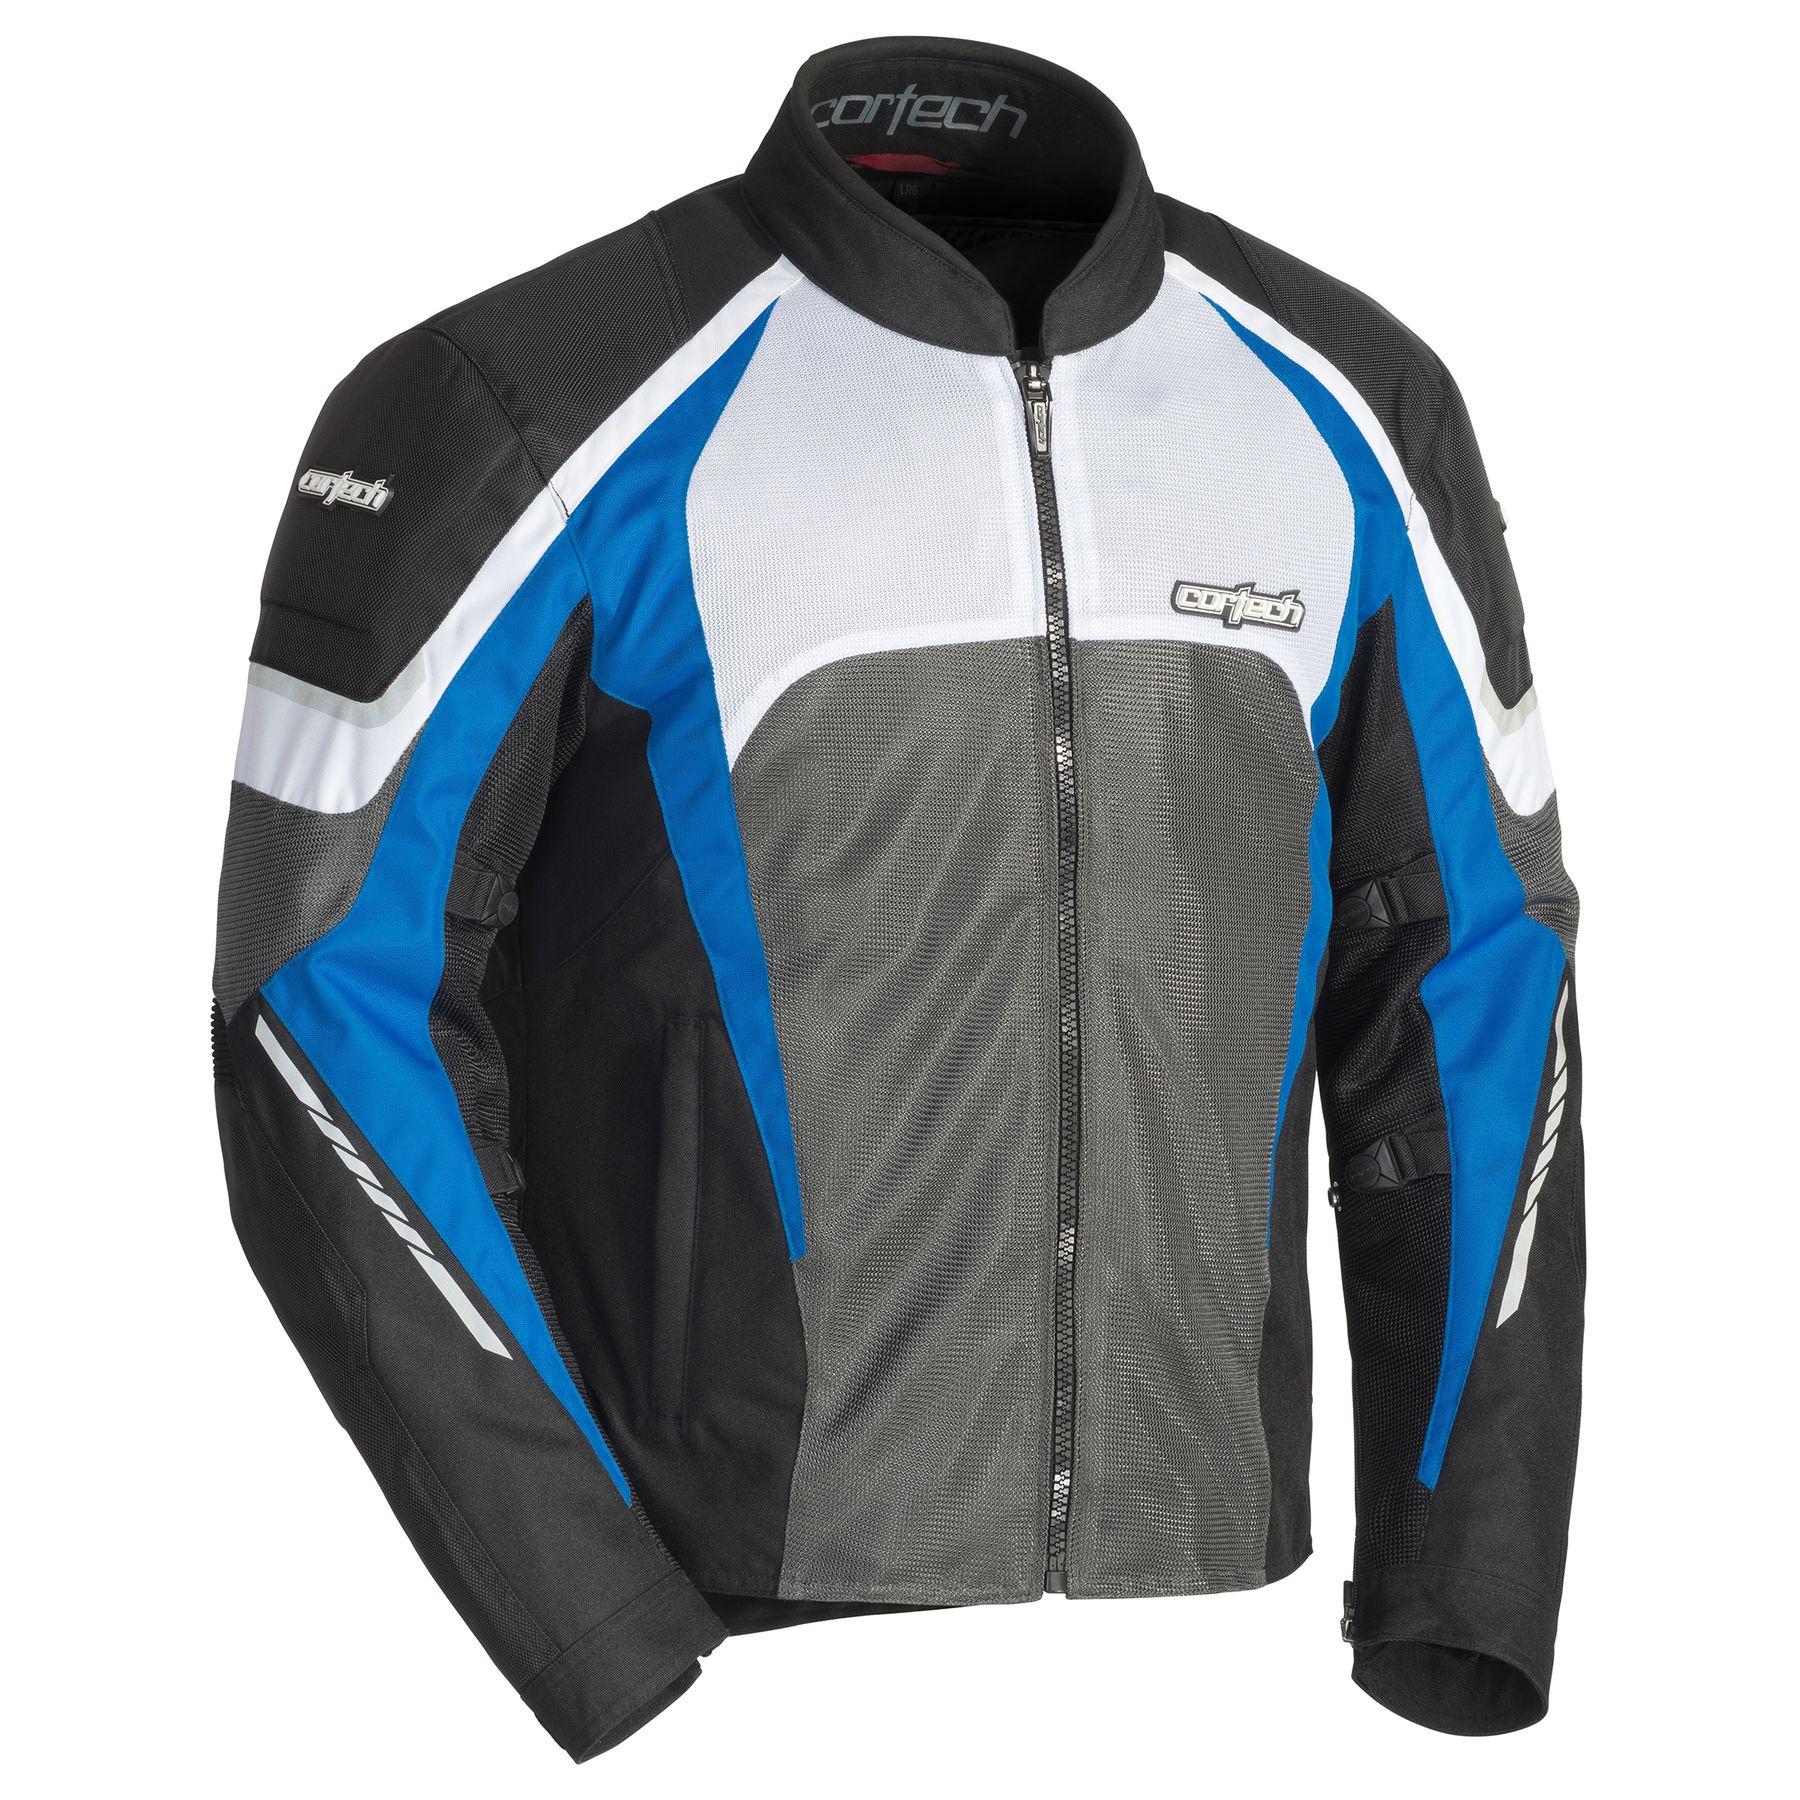 Cortech GX Sport Air 5.0 Mens Jacket Black/Blue